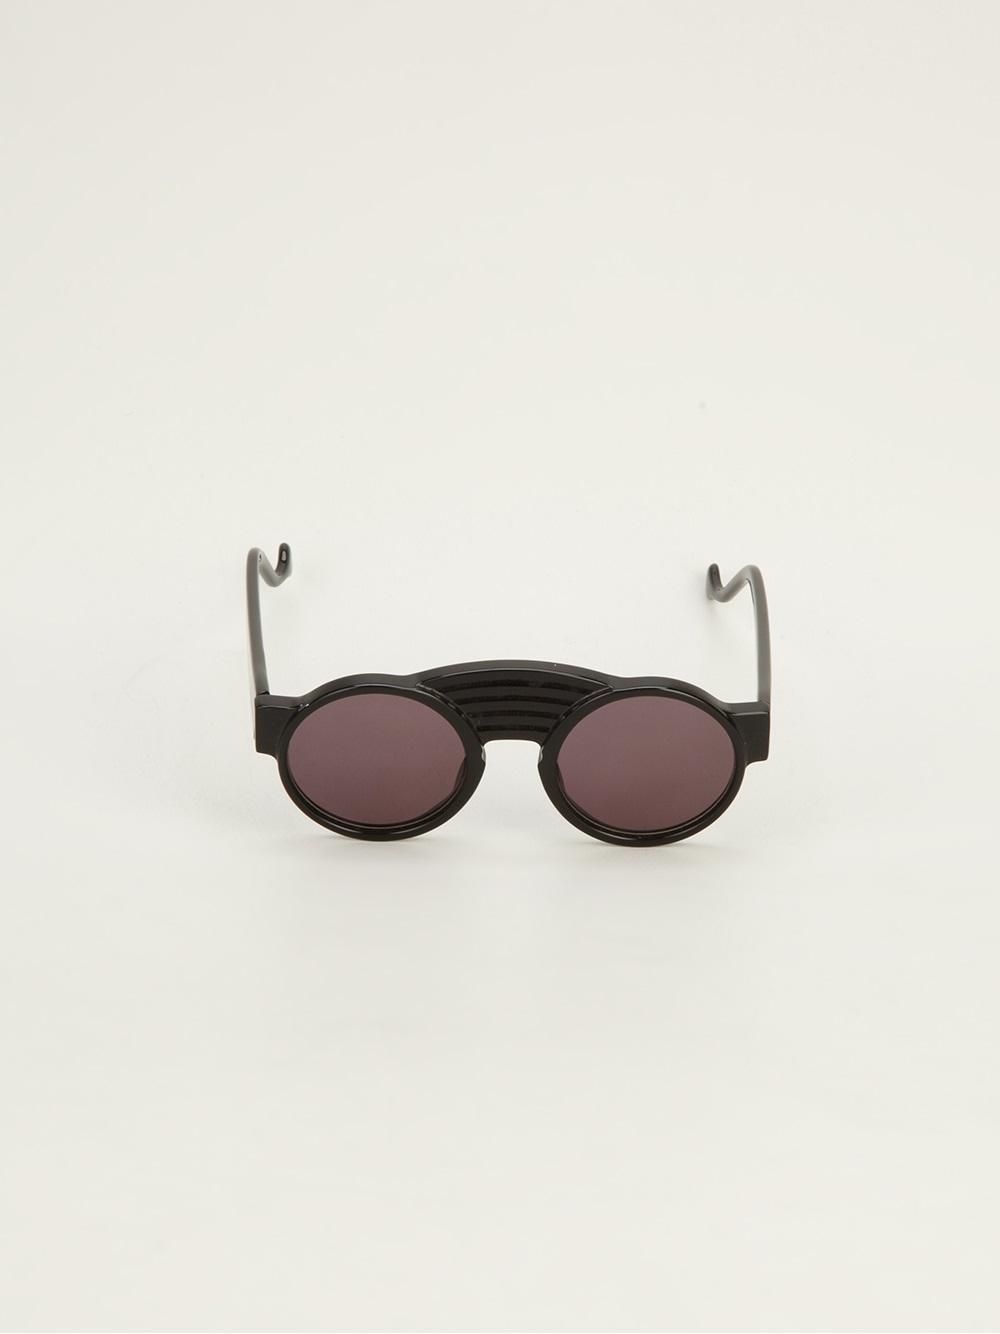 92c813dd185b Vintage Shades Traction Productions Wallis Noir Sunglasses in Black ...